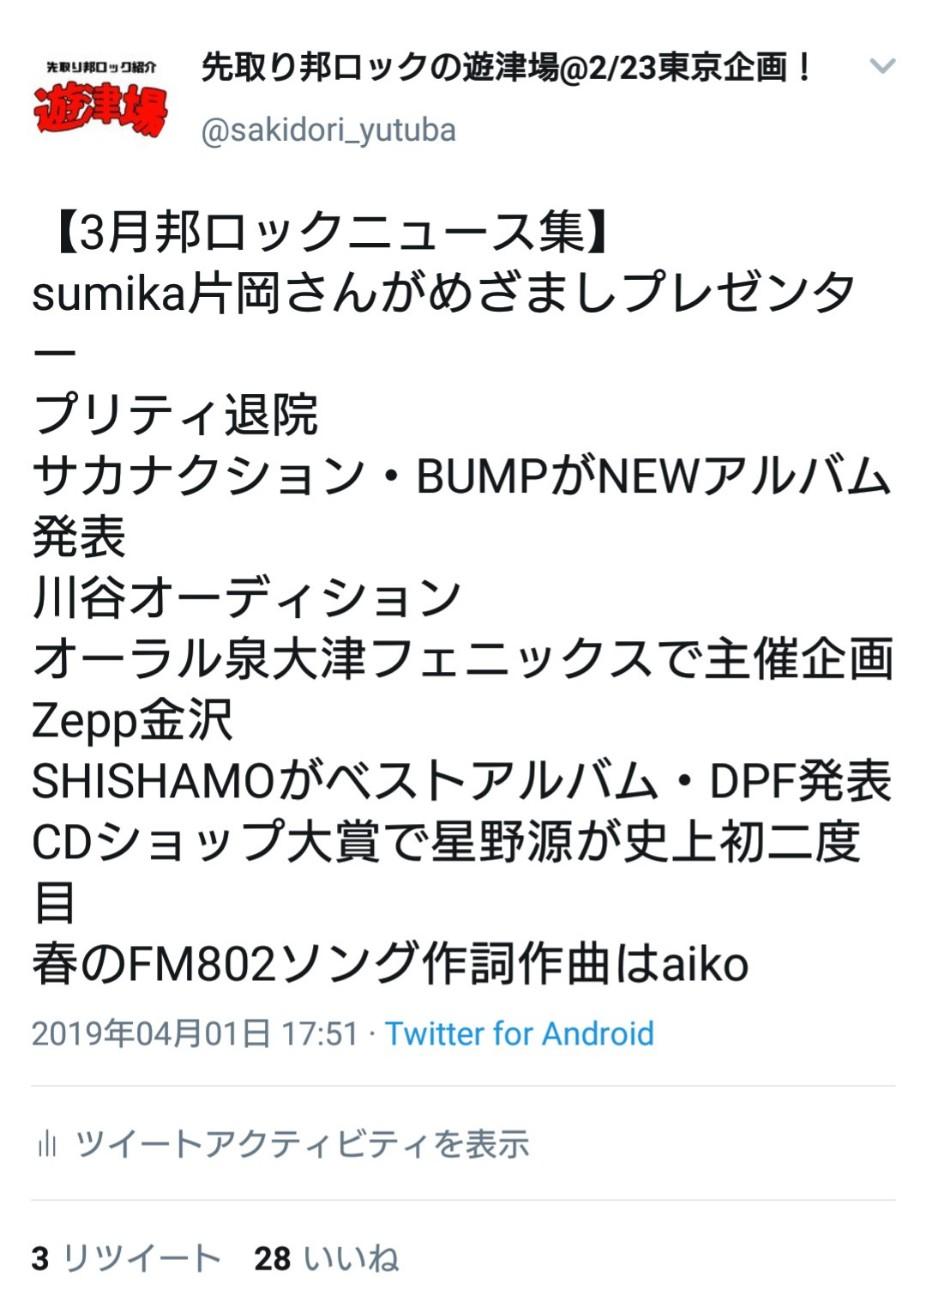 f:id:sakidoriyutsubarock:20191218004637j:plain